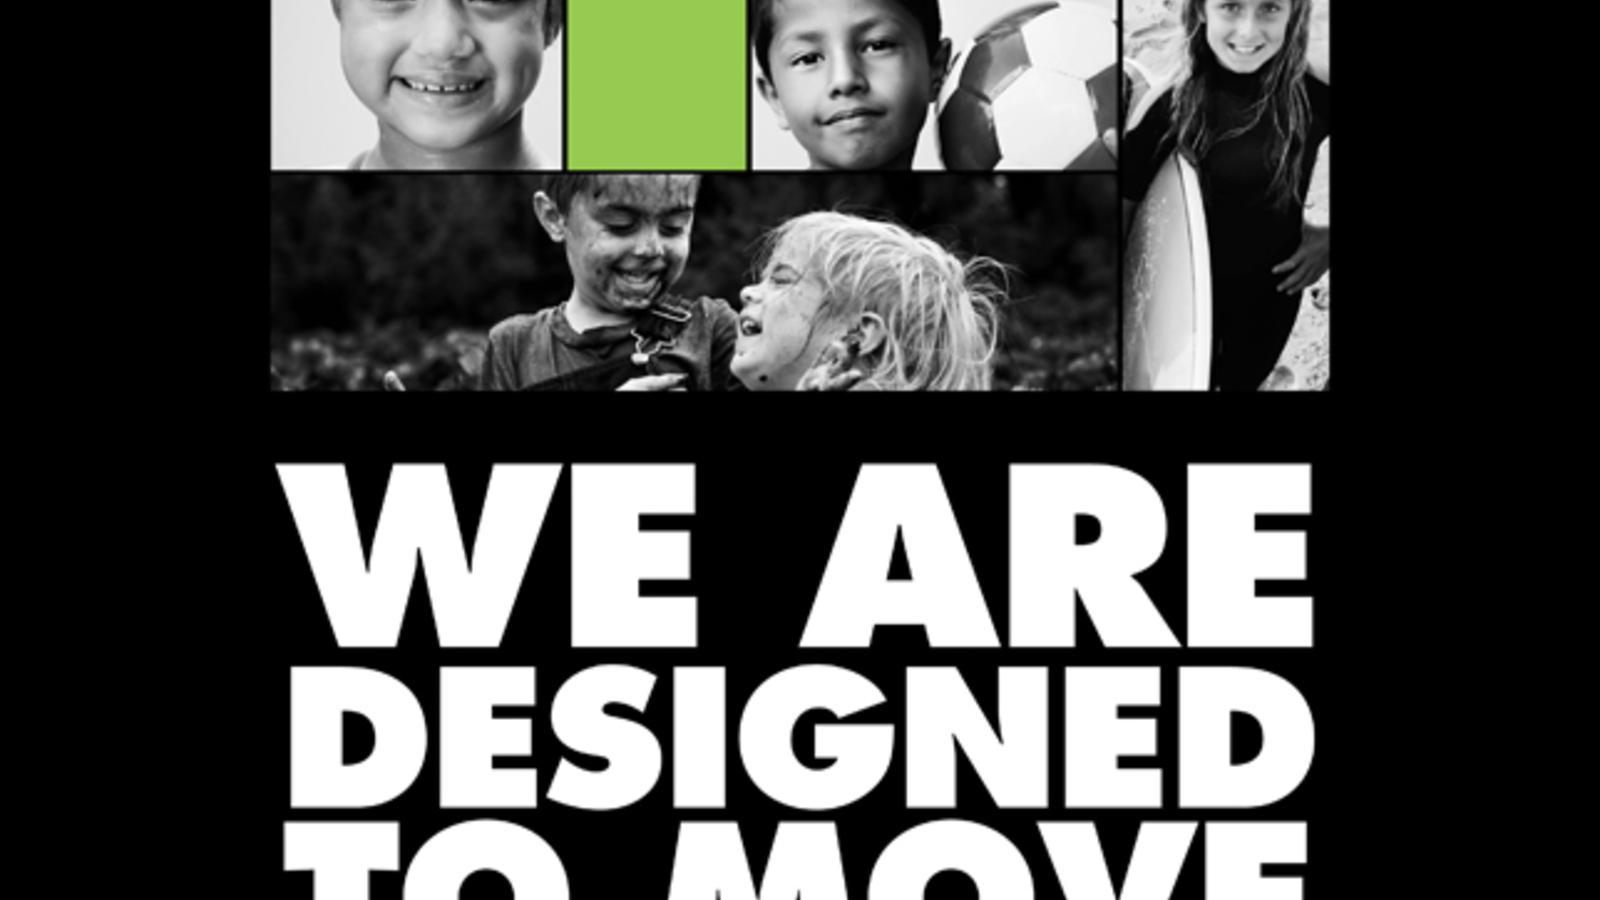 We_Are_Designed_To_Move_original_14467